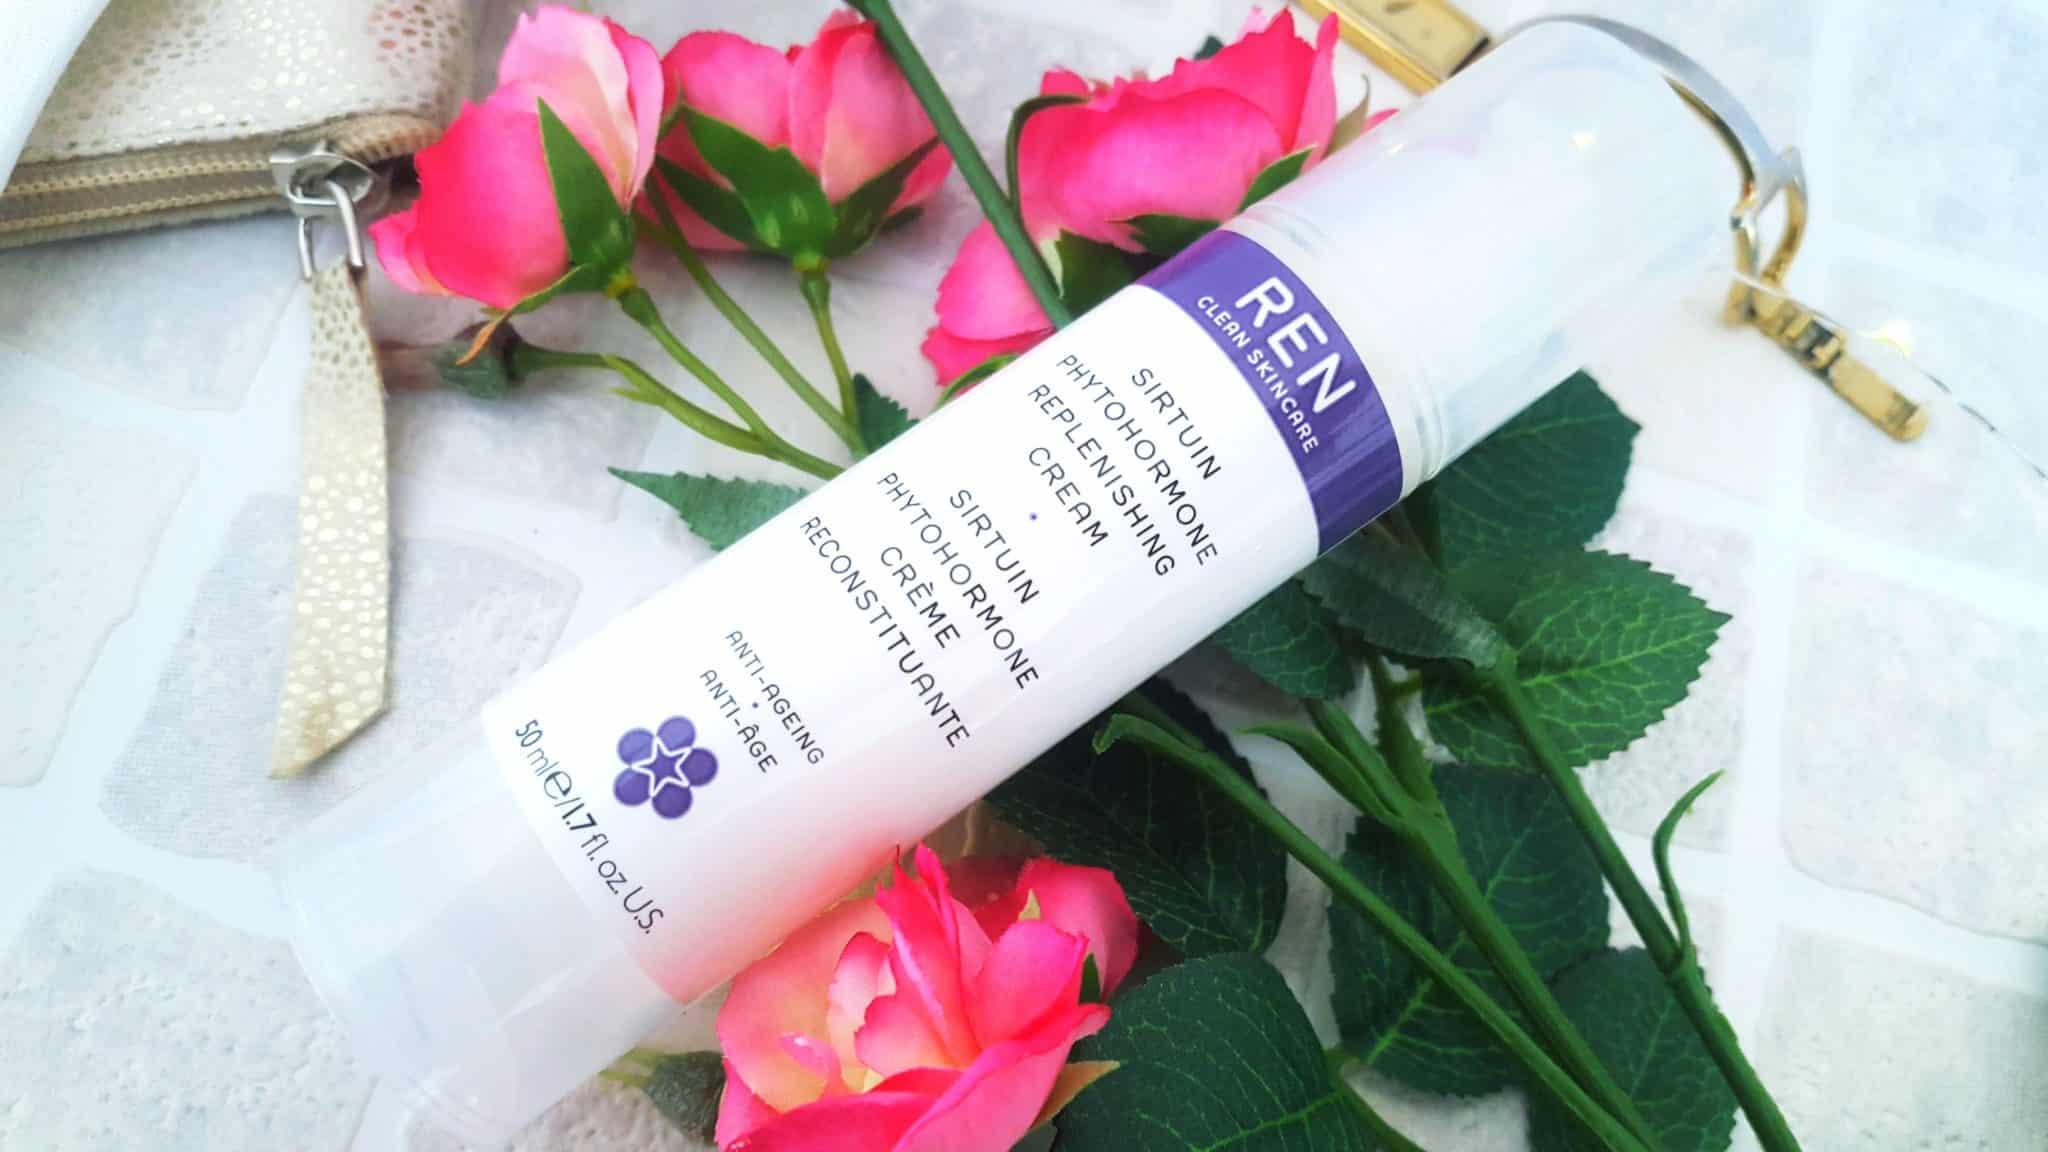 ren-clean-skincare-review